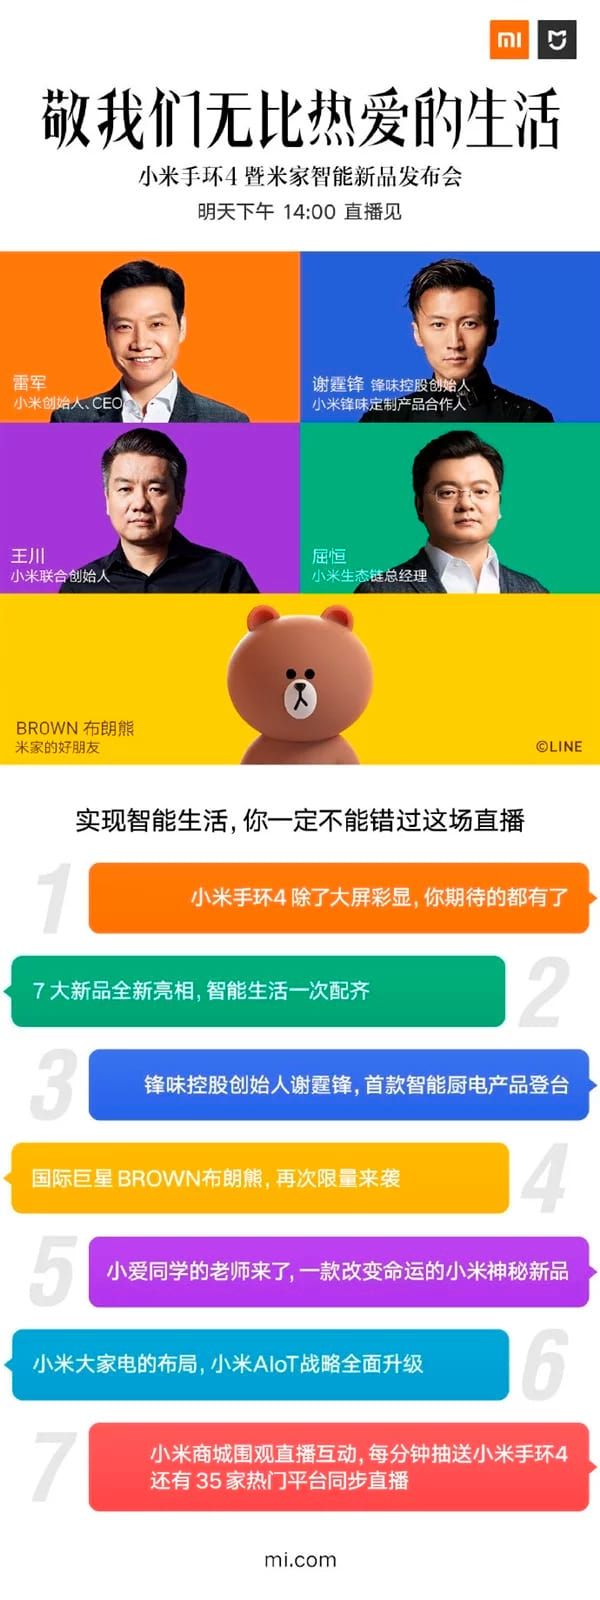 Xiaomi deve anunciar 8 novos produtos